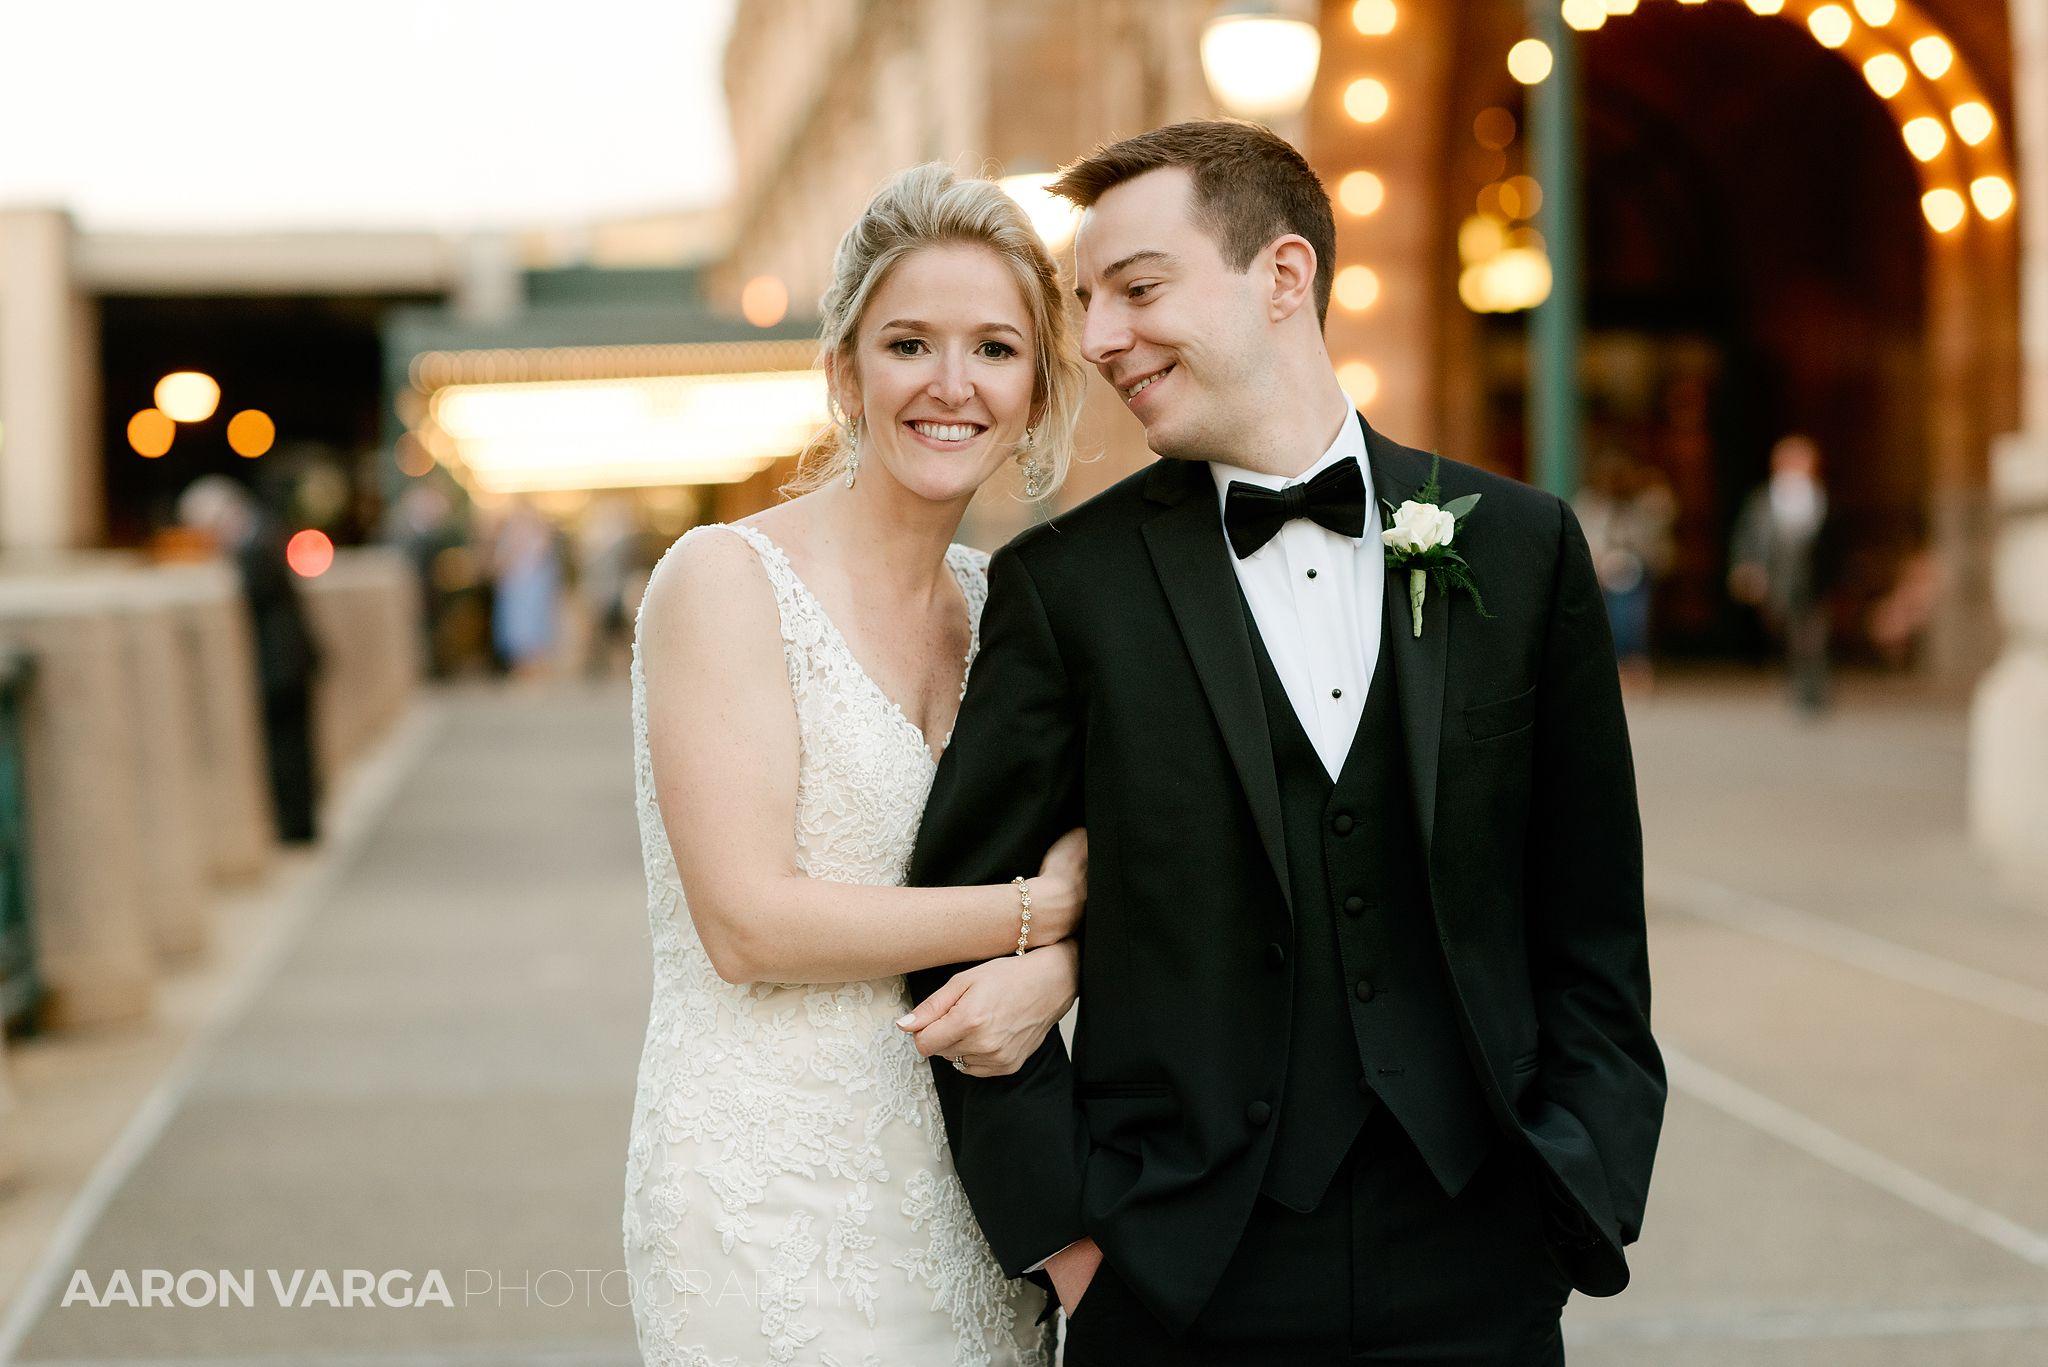 Wedding dresses pittsburgh  Aaron Varga Photography  Pittsburgh Wedding Photographer